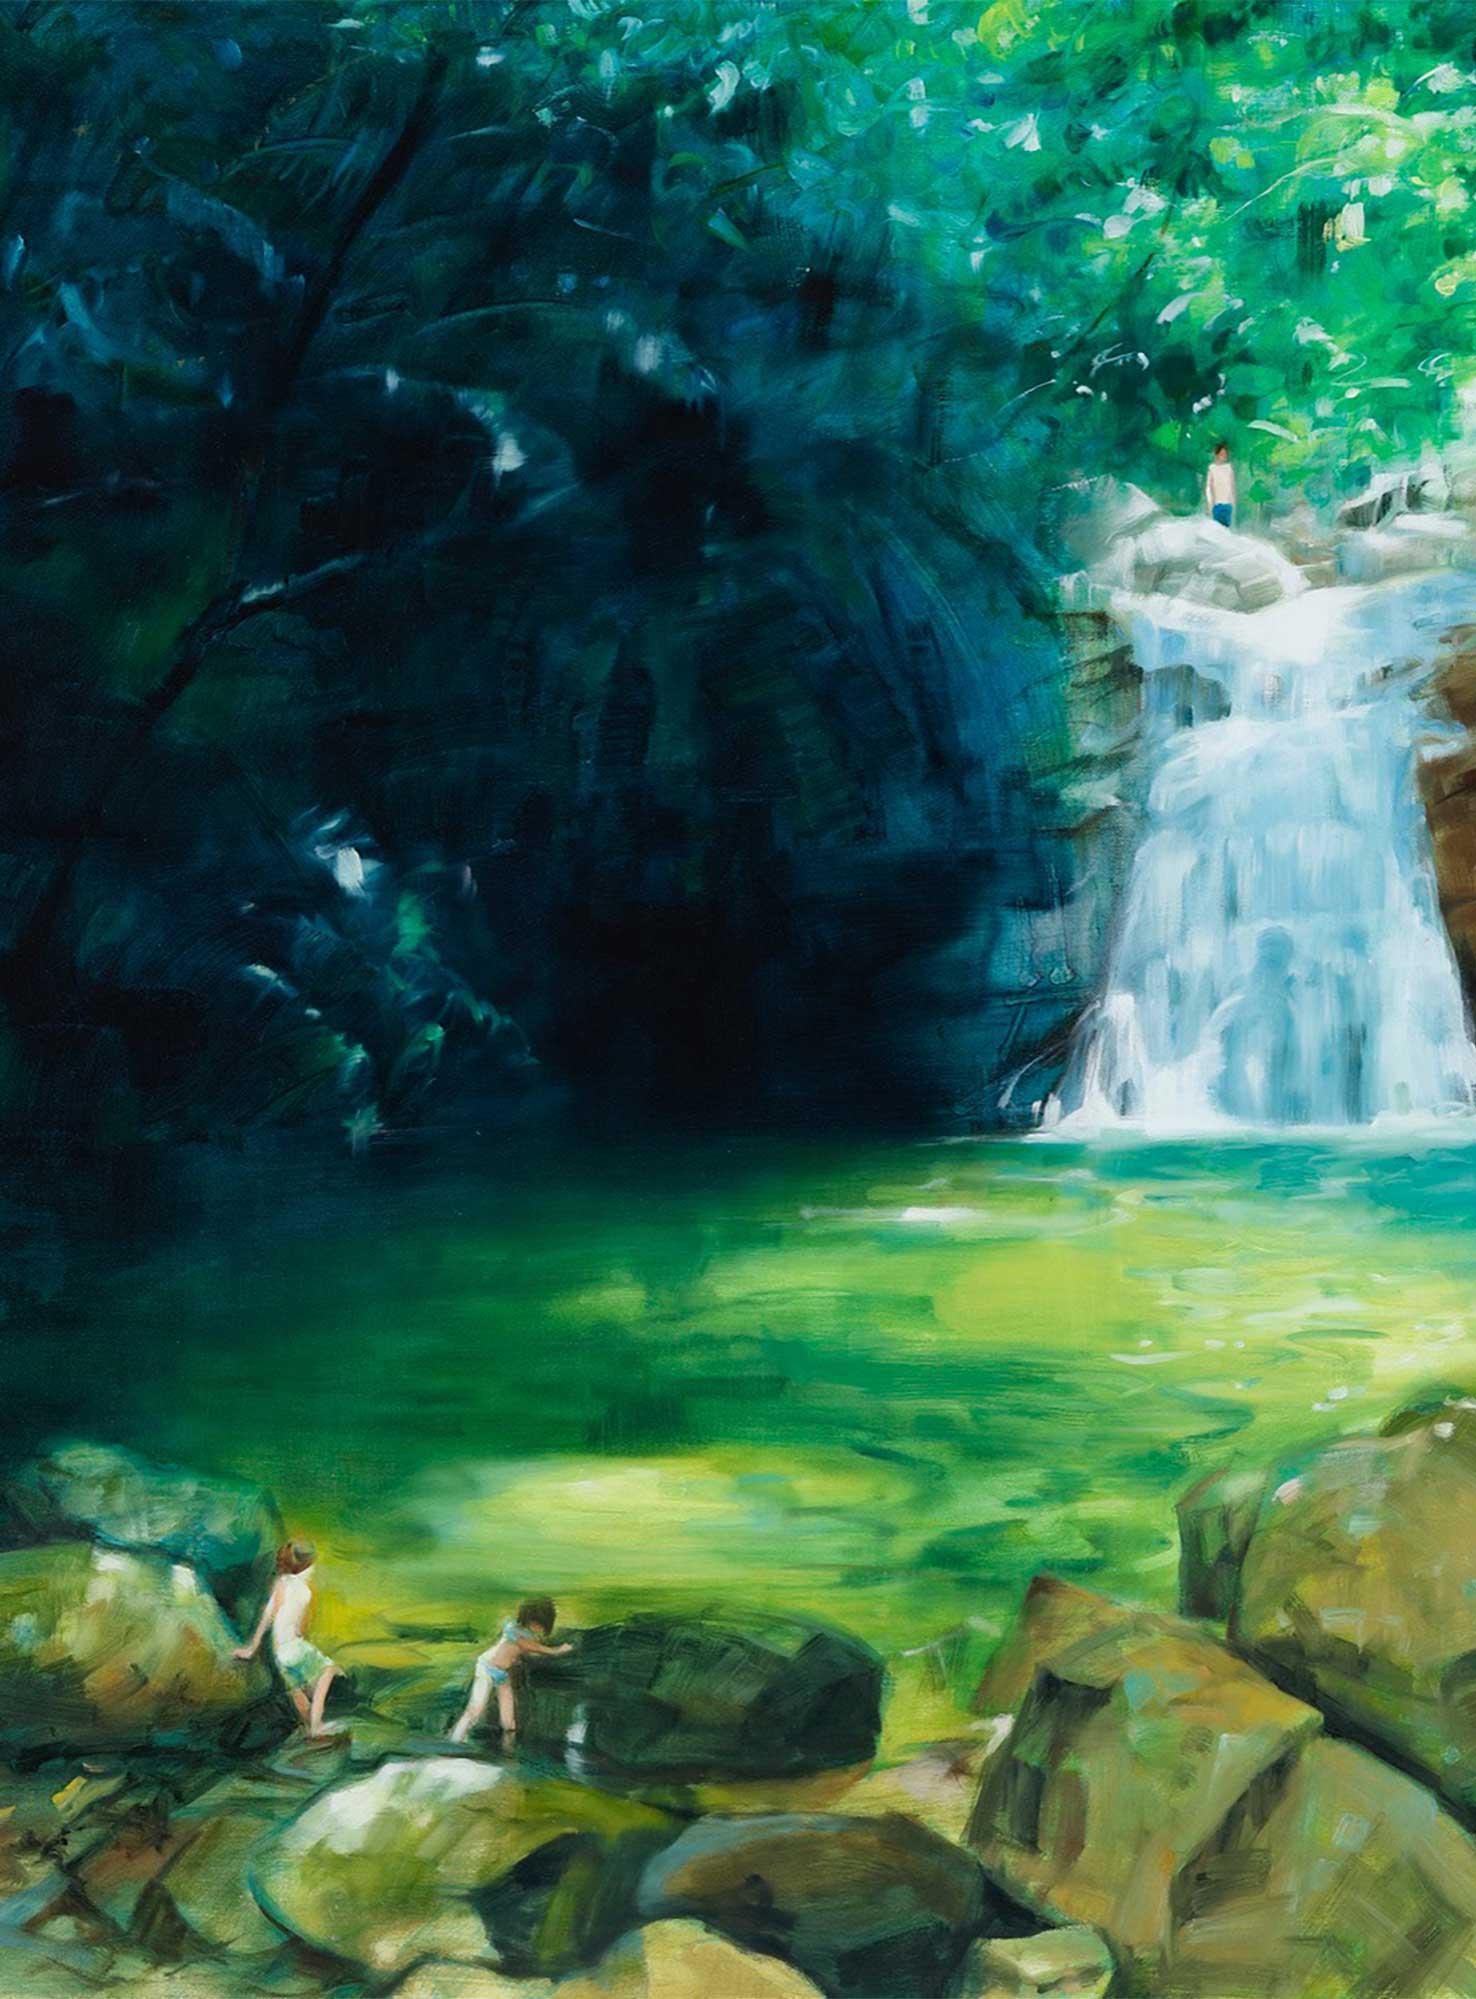 小西真奈「Waterfall - Green」(2015)